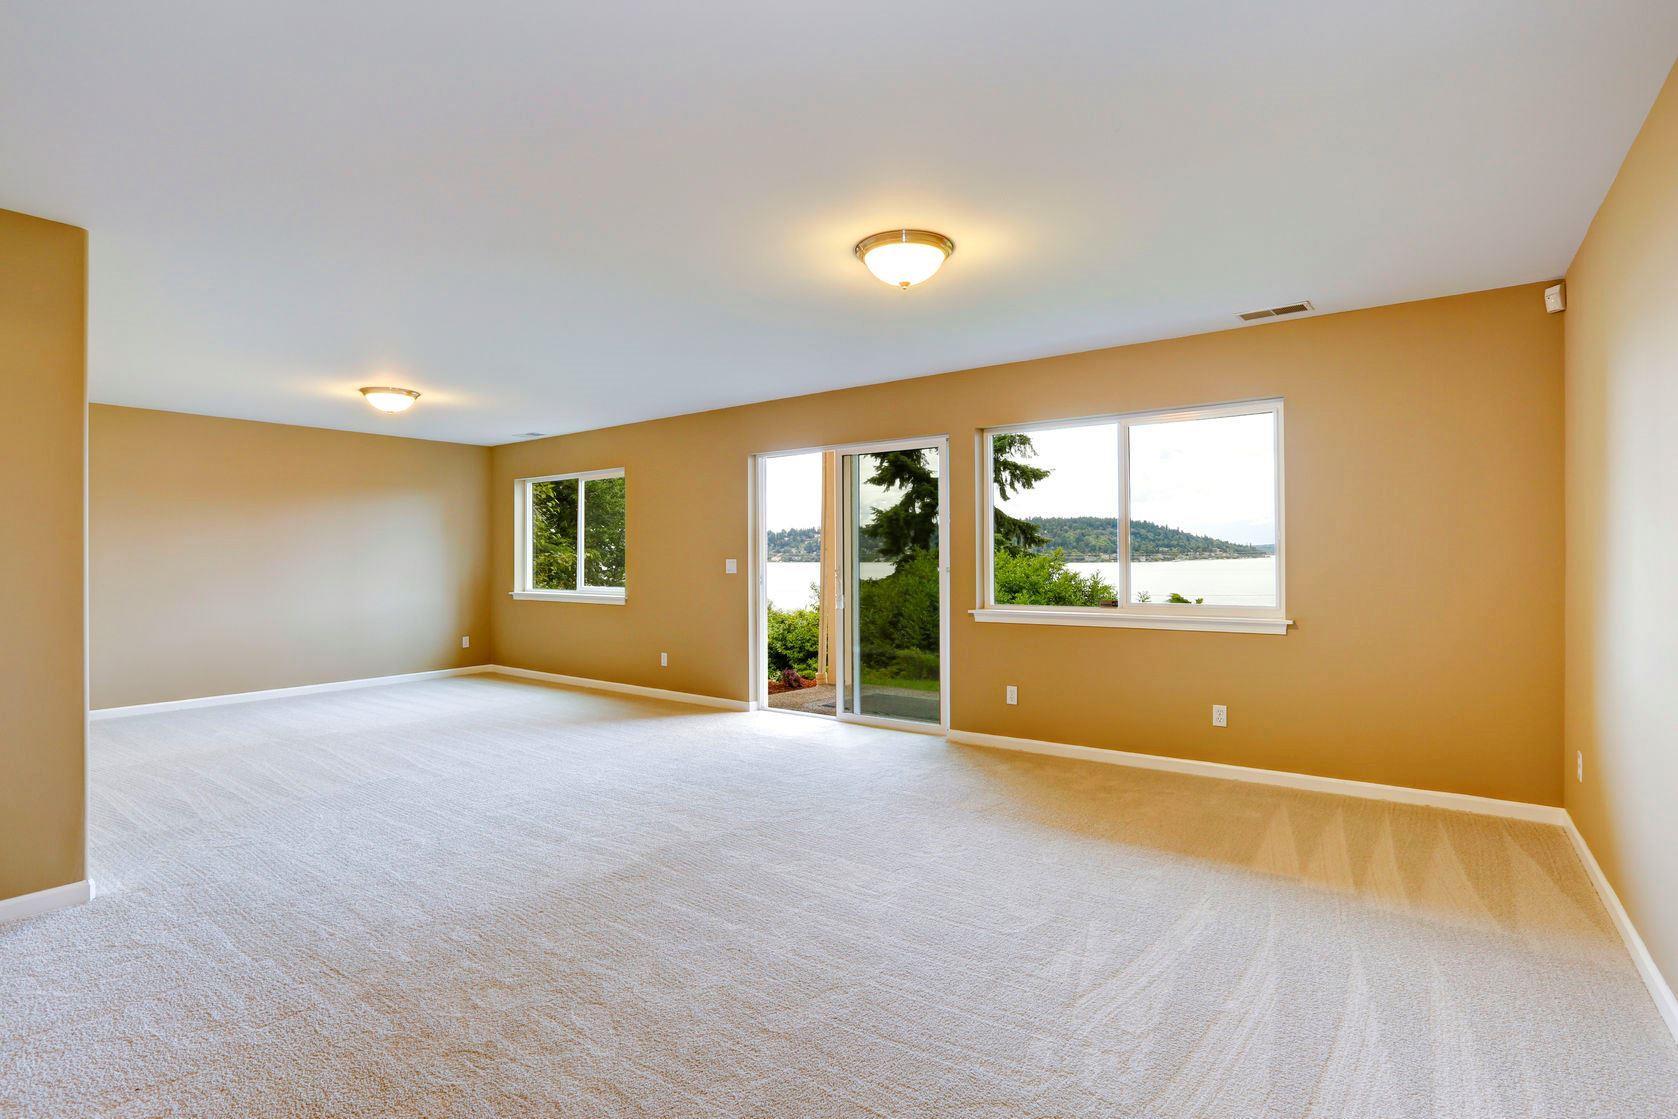 Wood flooring contractors ct hardwood refinishing for Northwest flooring